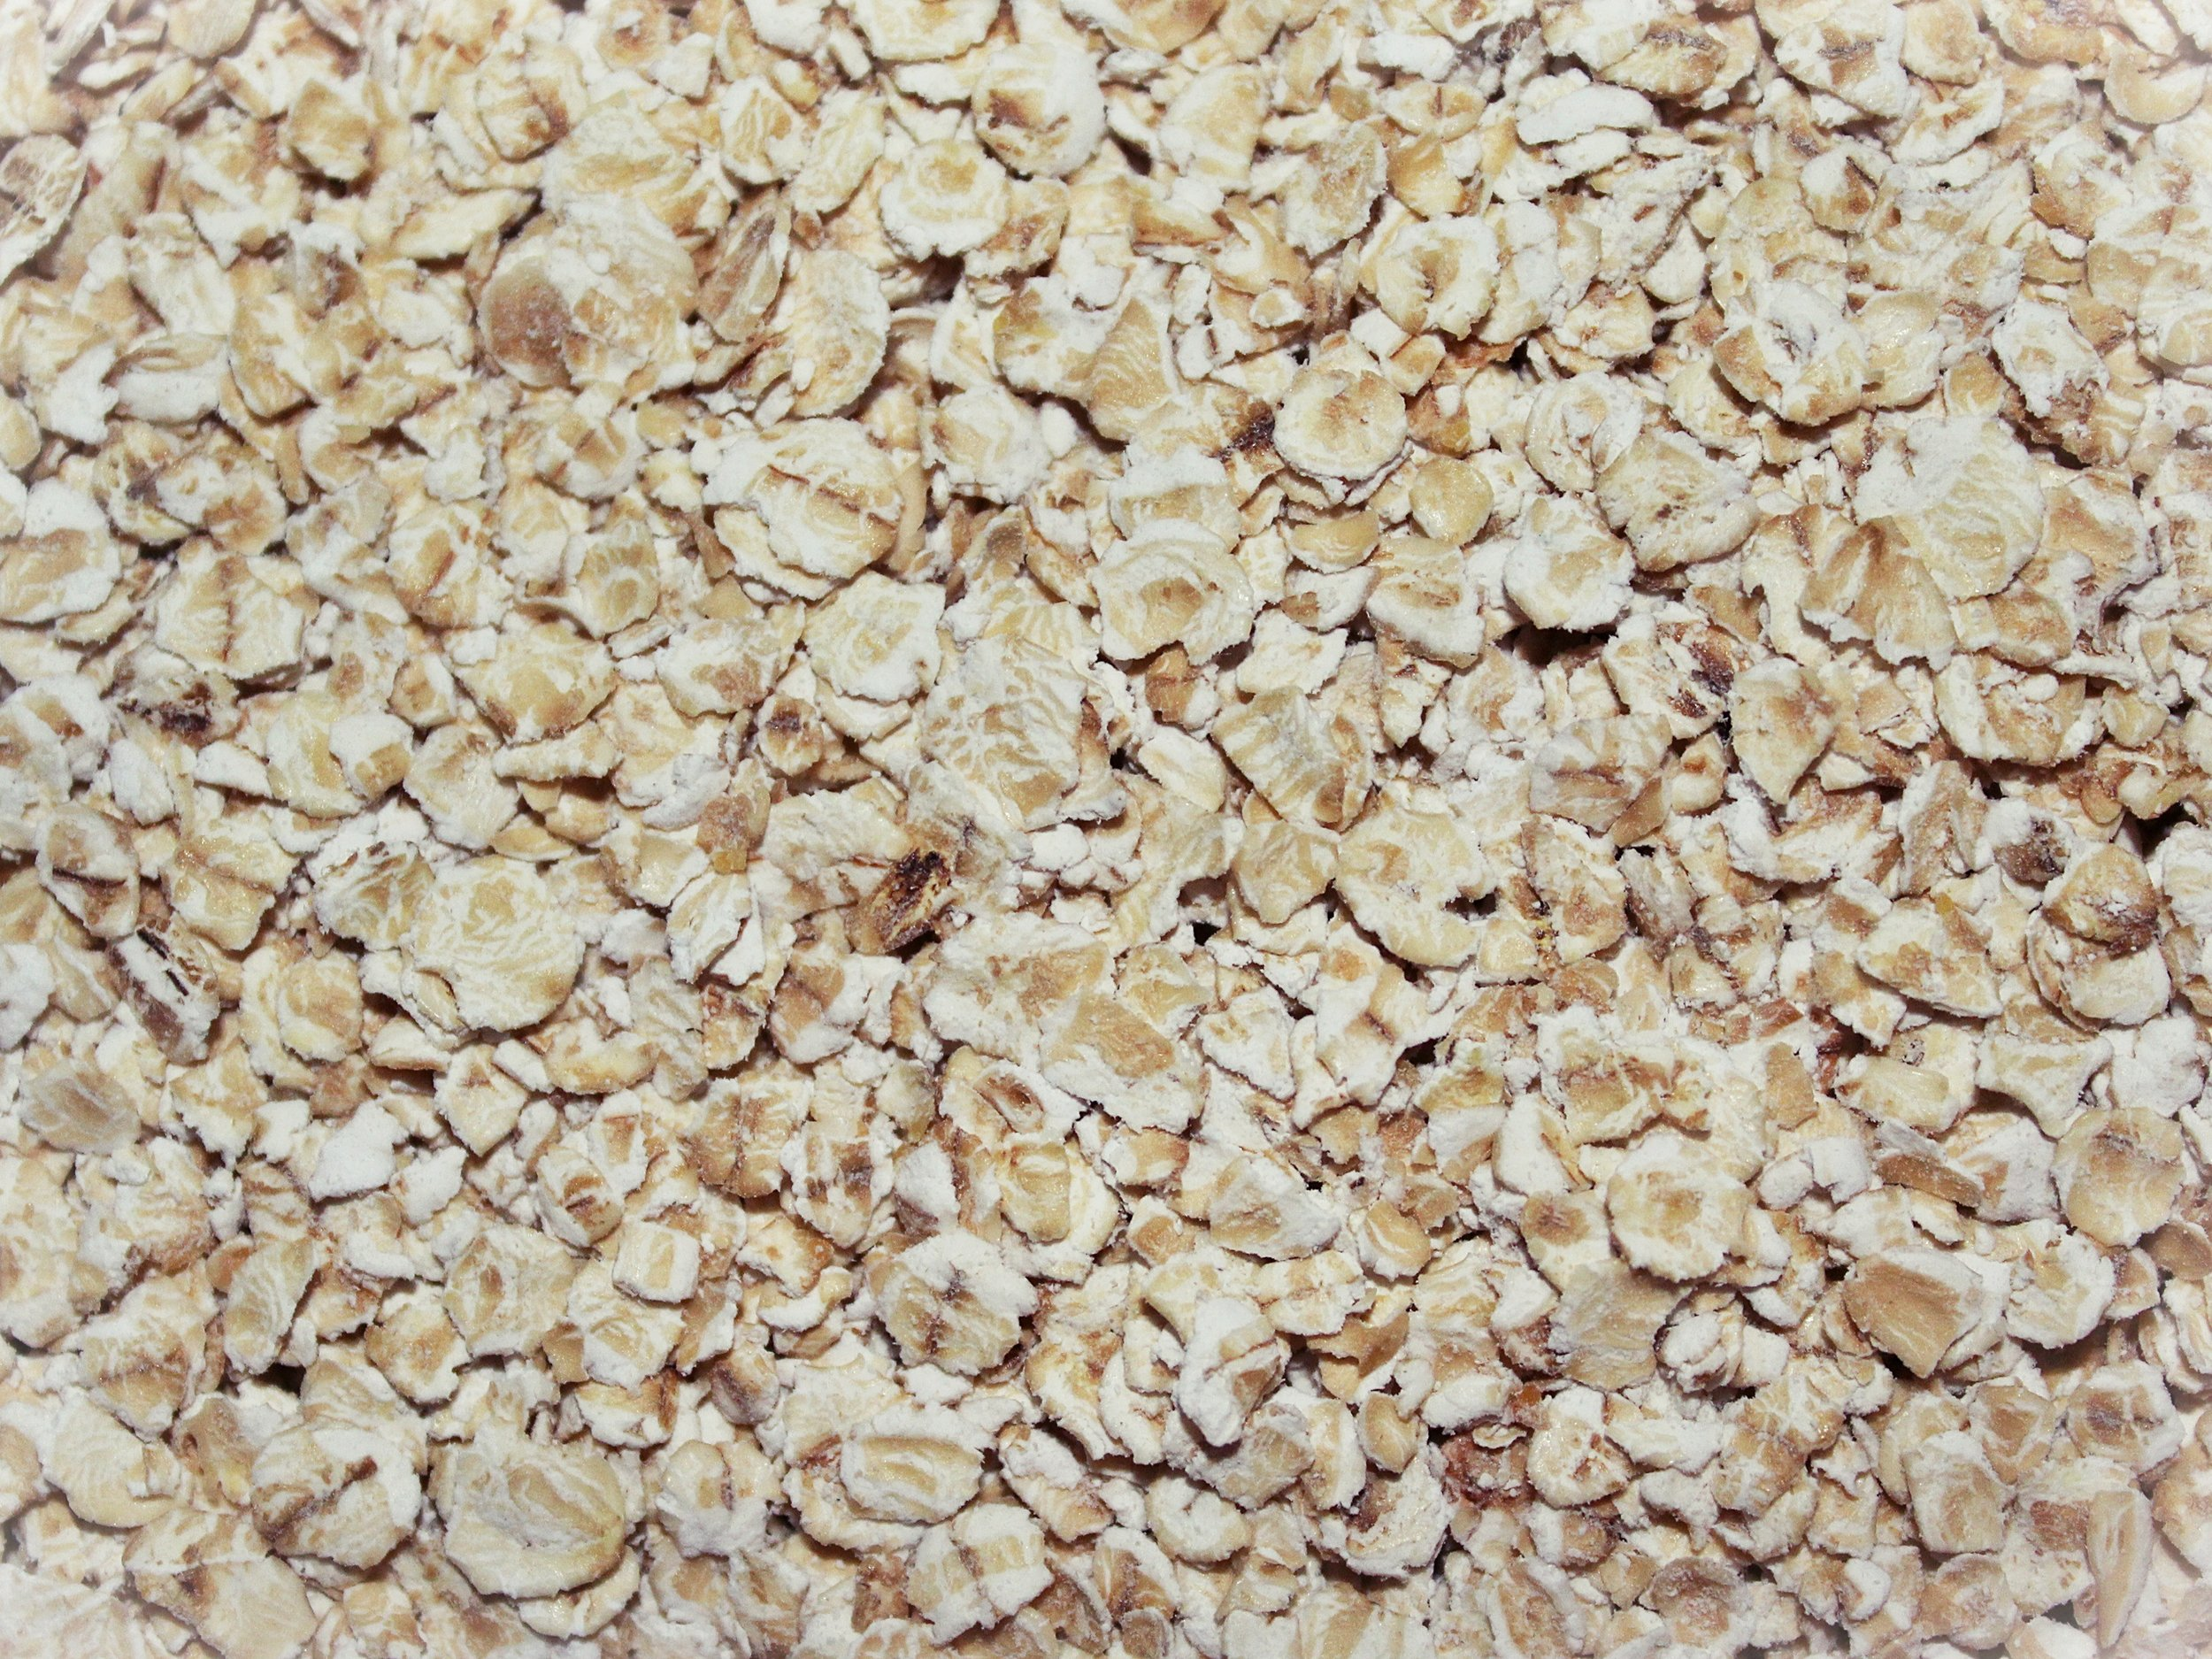 Oatmeal Image by Tante Tati.jpg